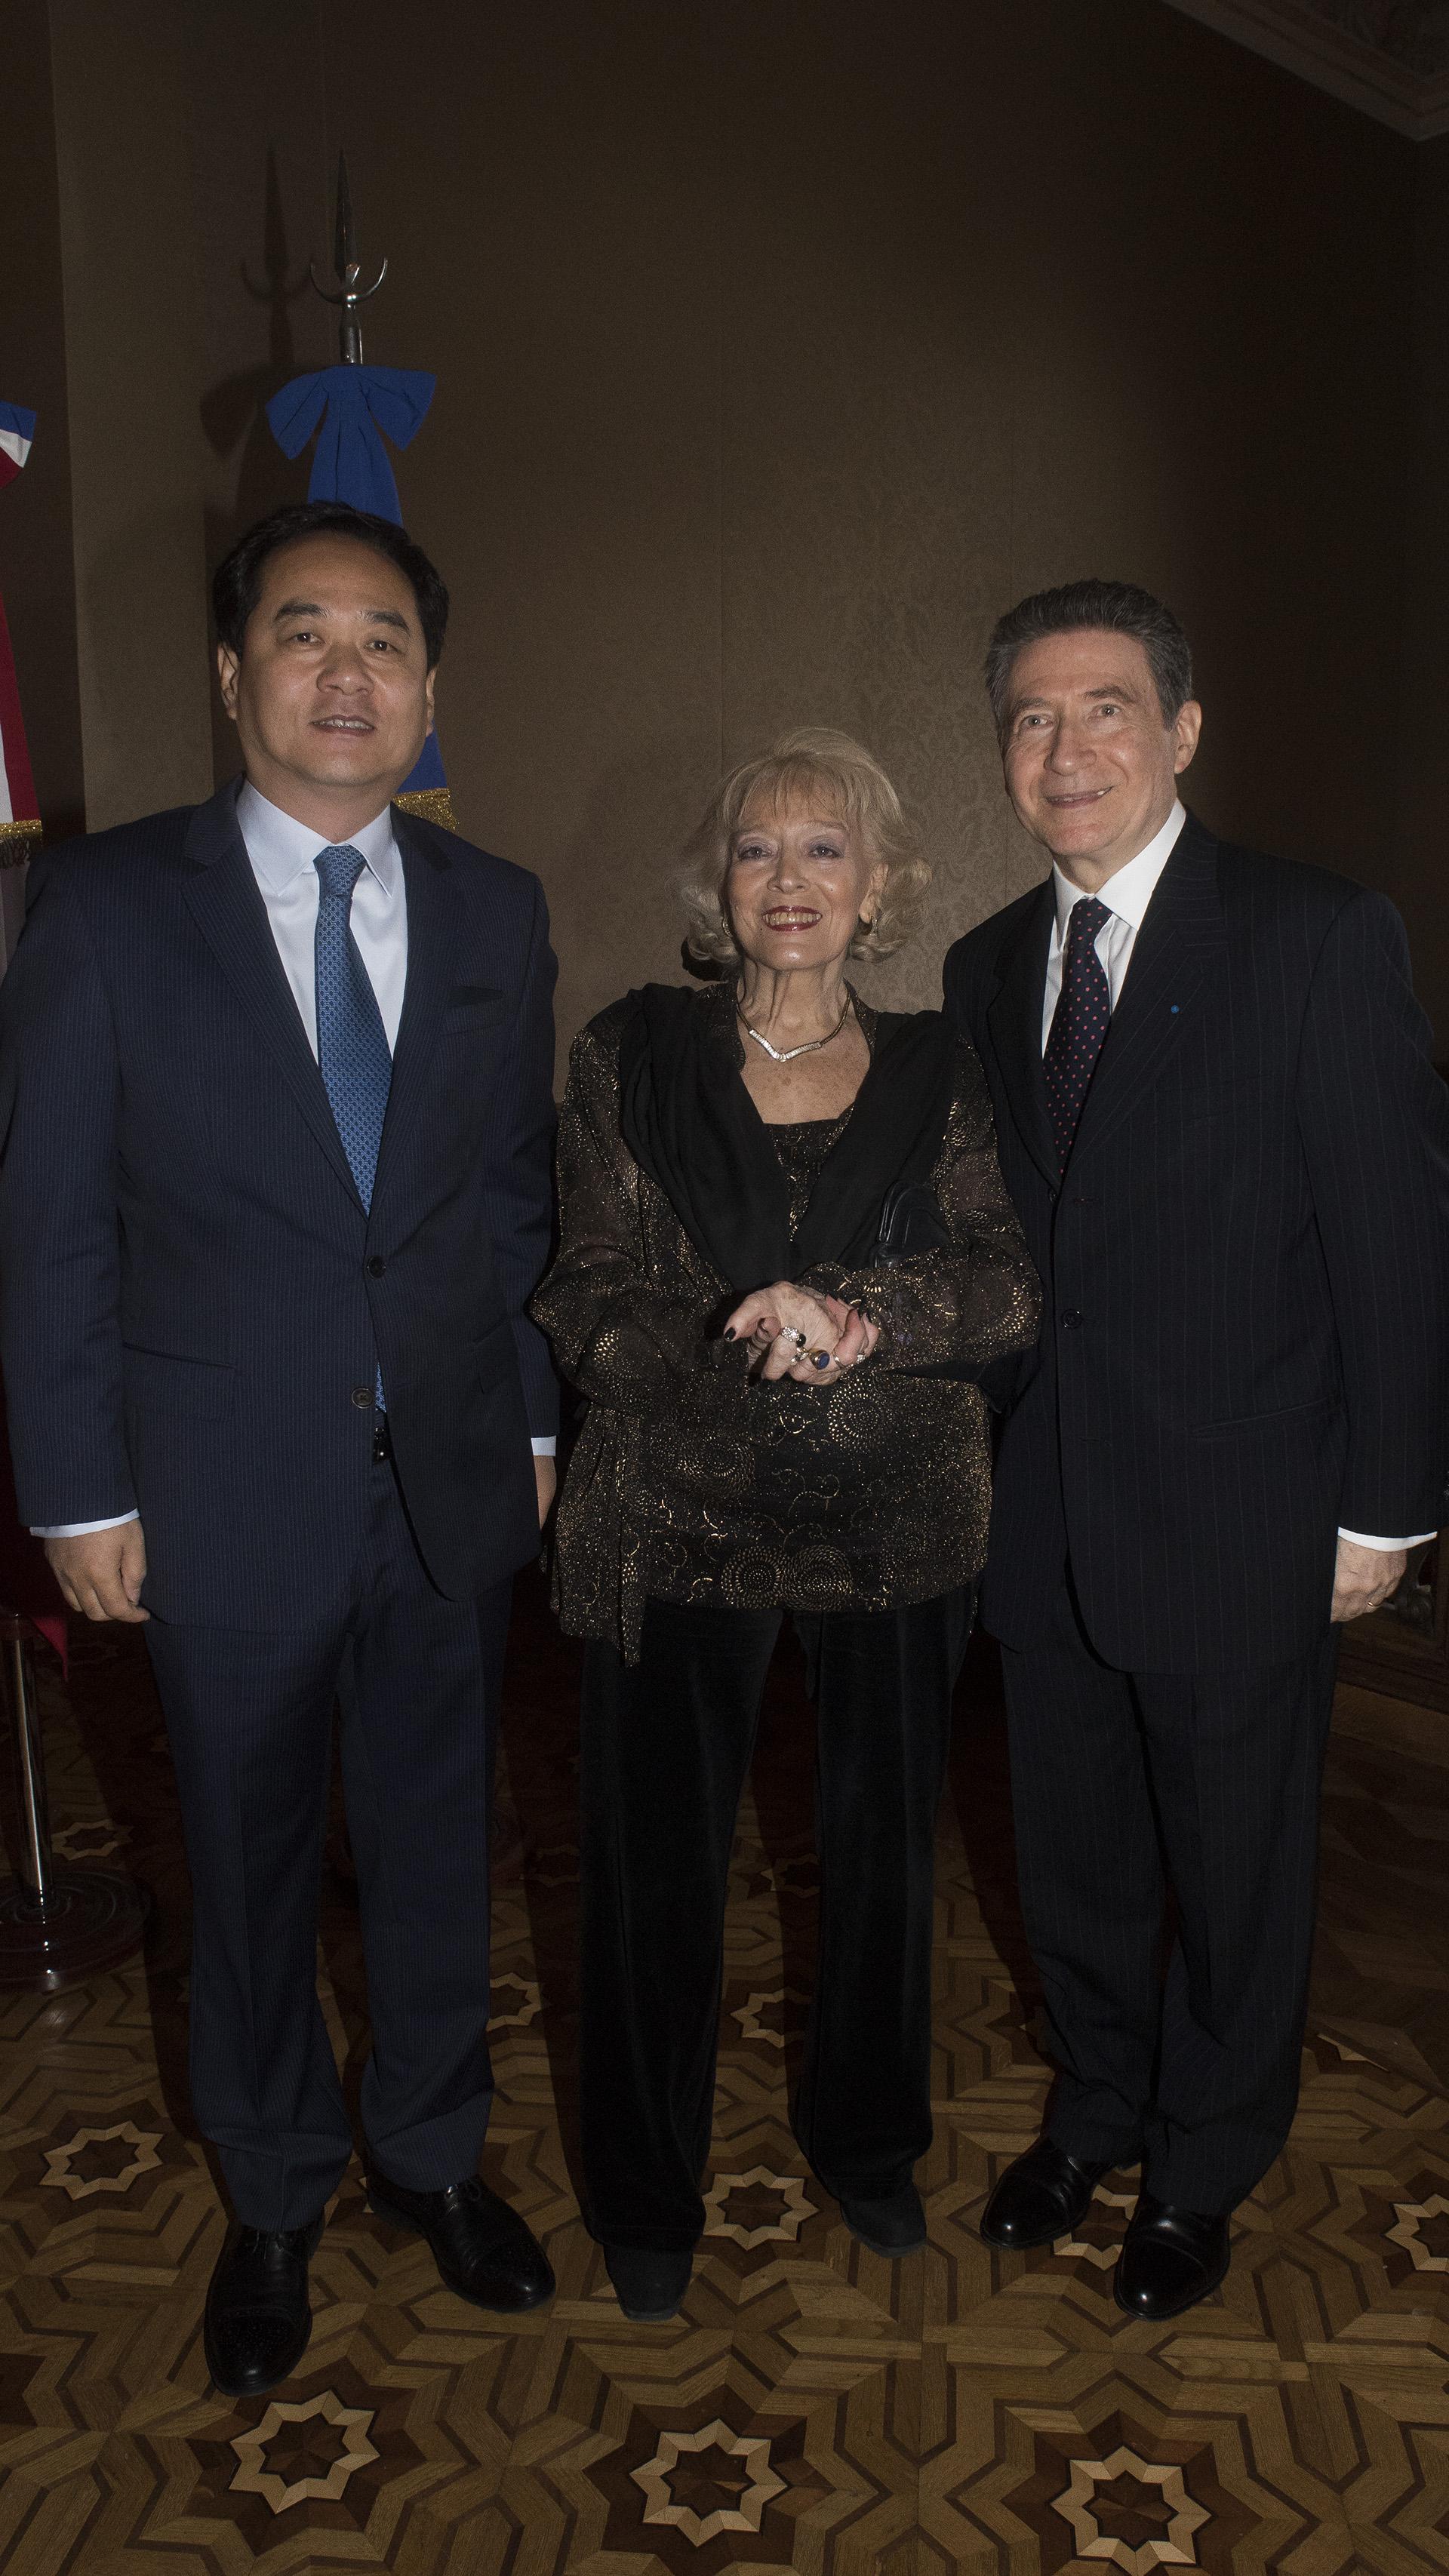 El embajador de la República Popular China, Yang Wanming